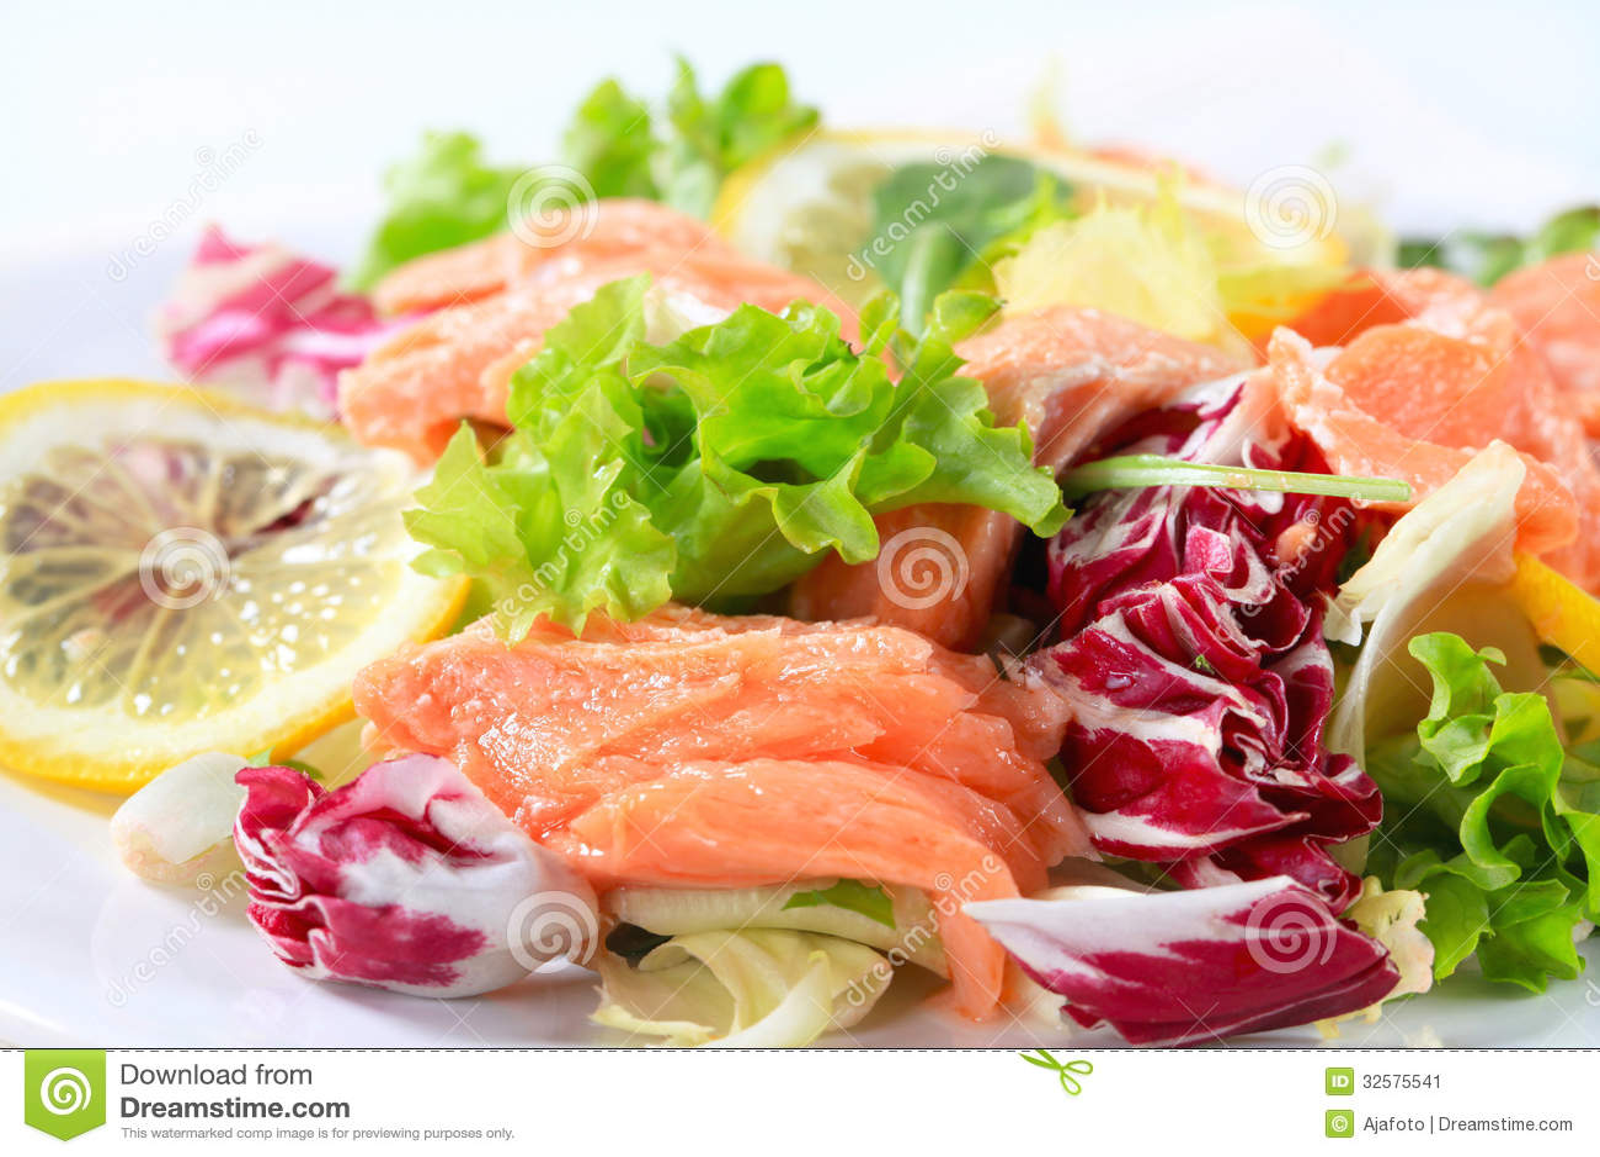 salade fumée de truite image stock. image du calorie - 32575541